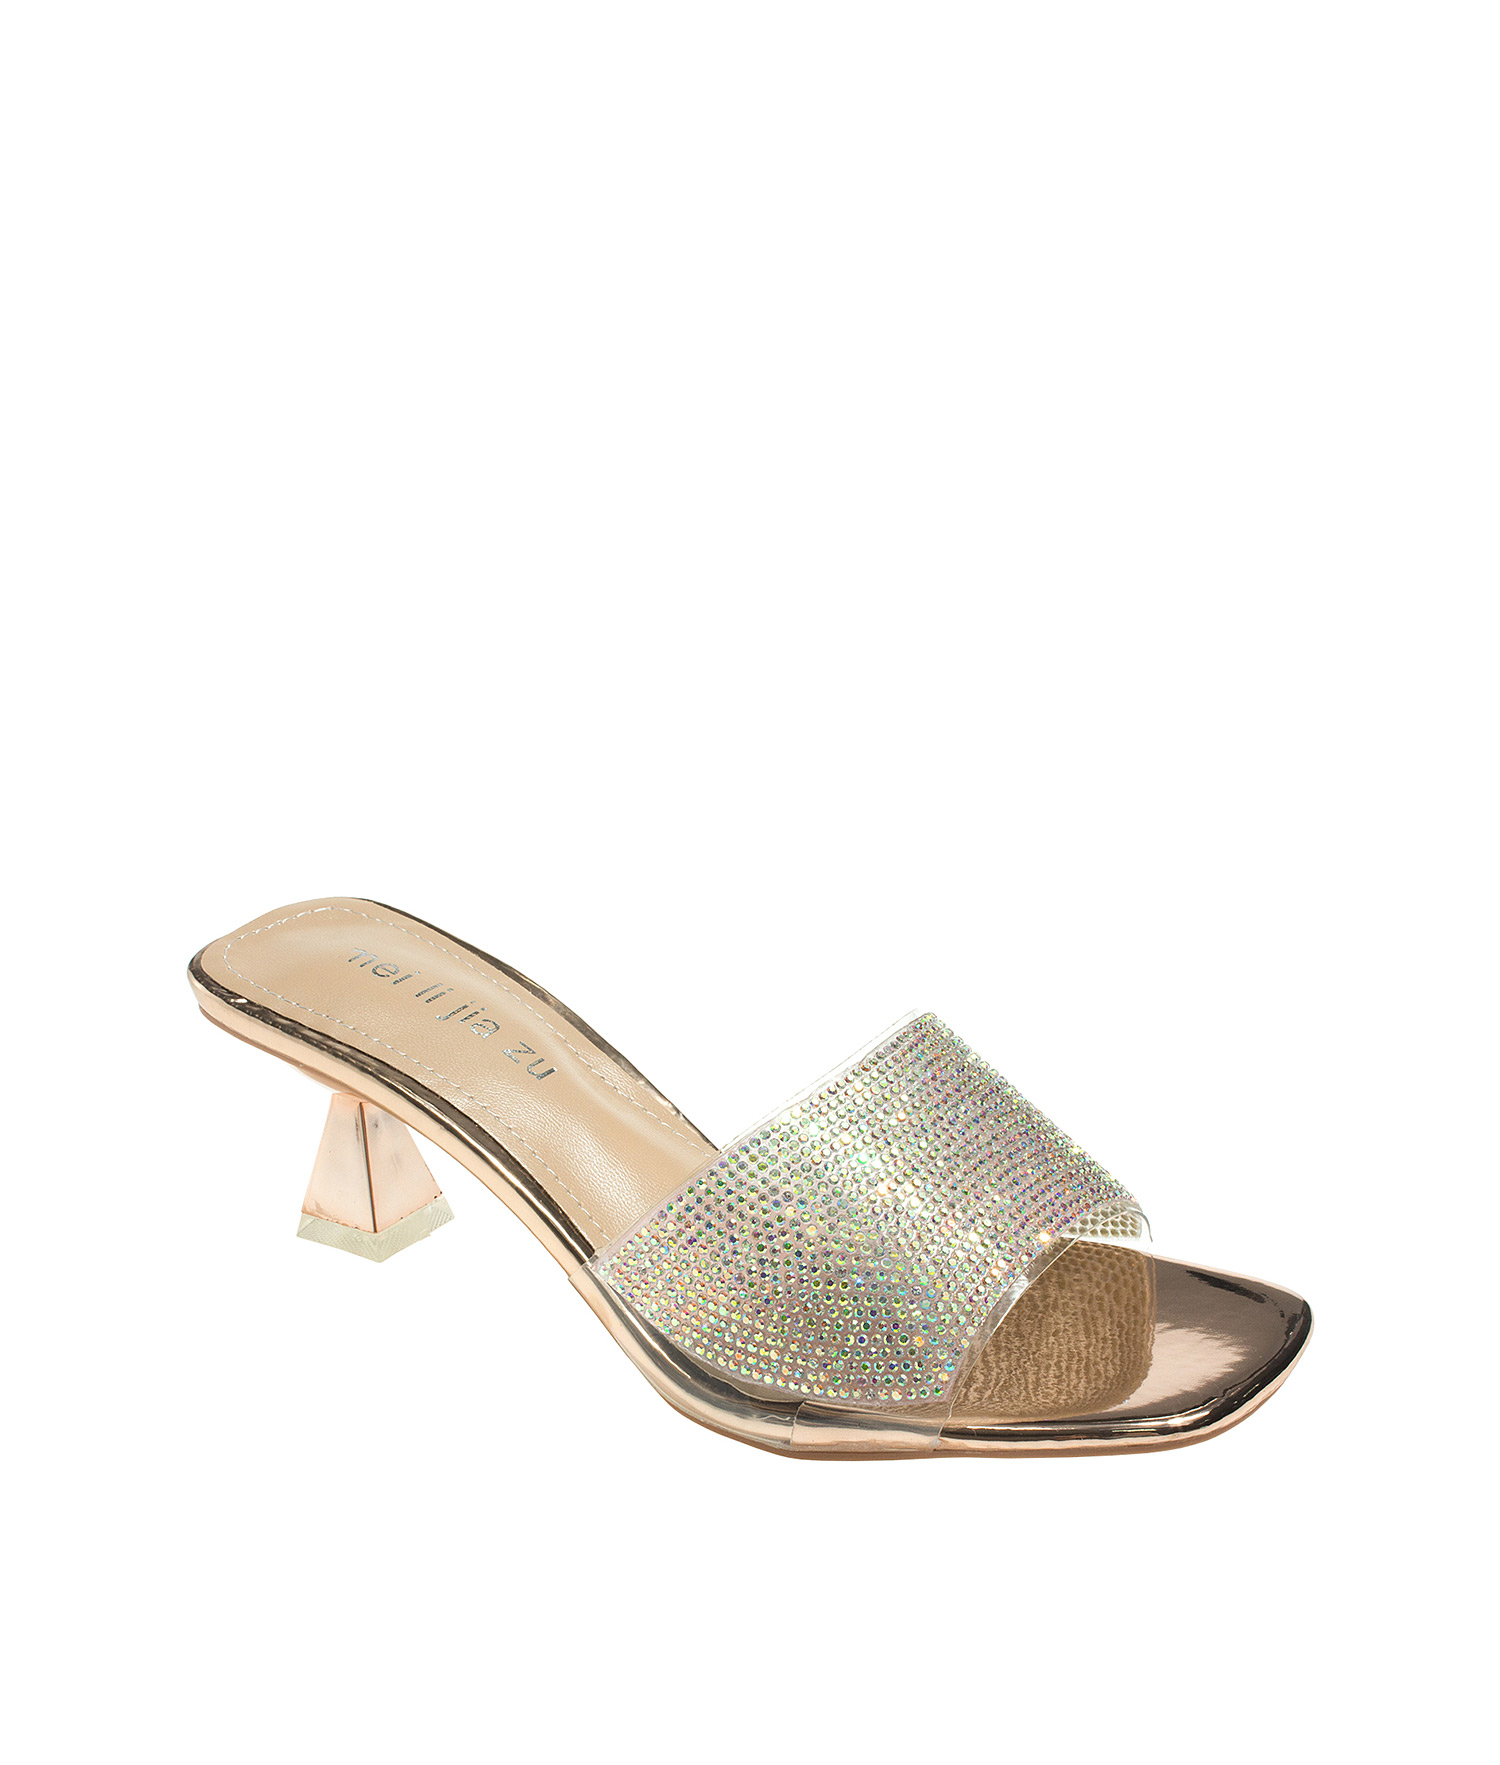 5b24fc210022 Embellished Clear Rose Gold Mule Heels - annakastleshoes.com